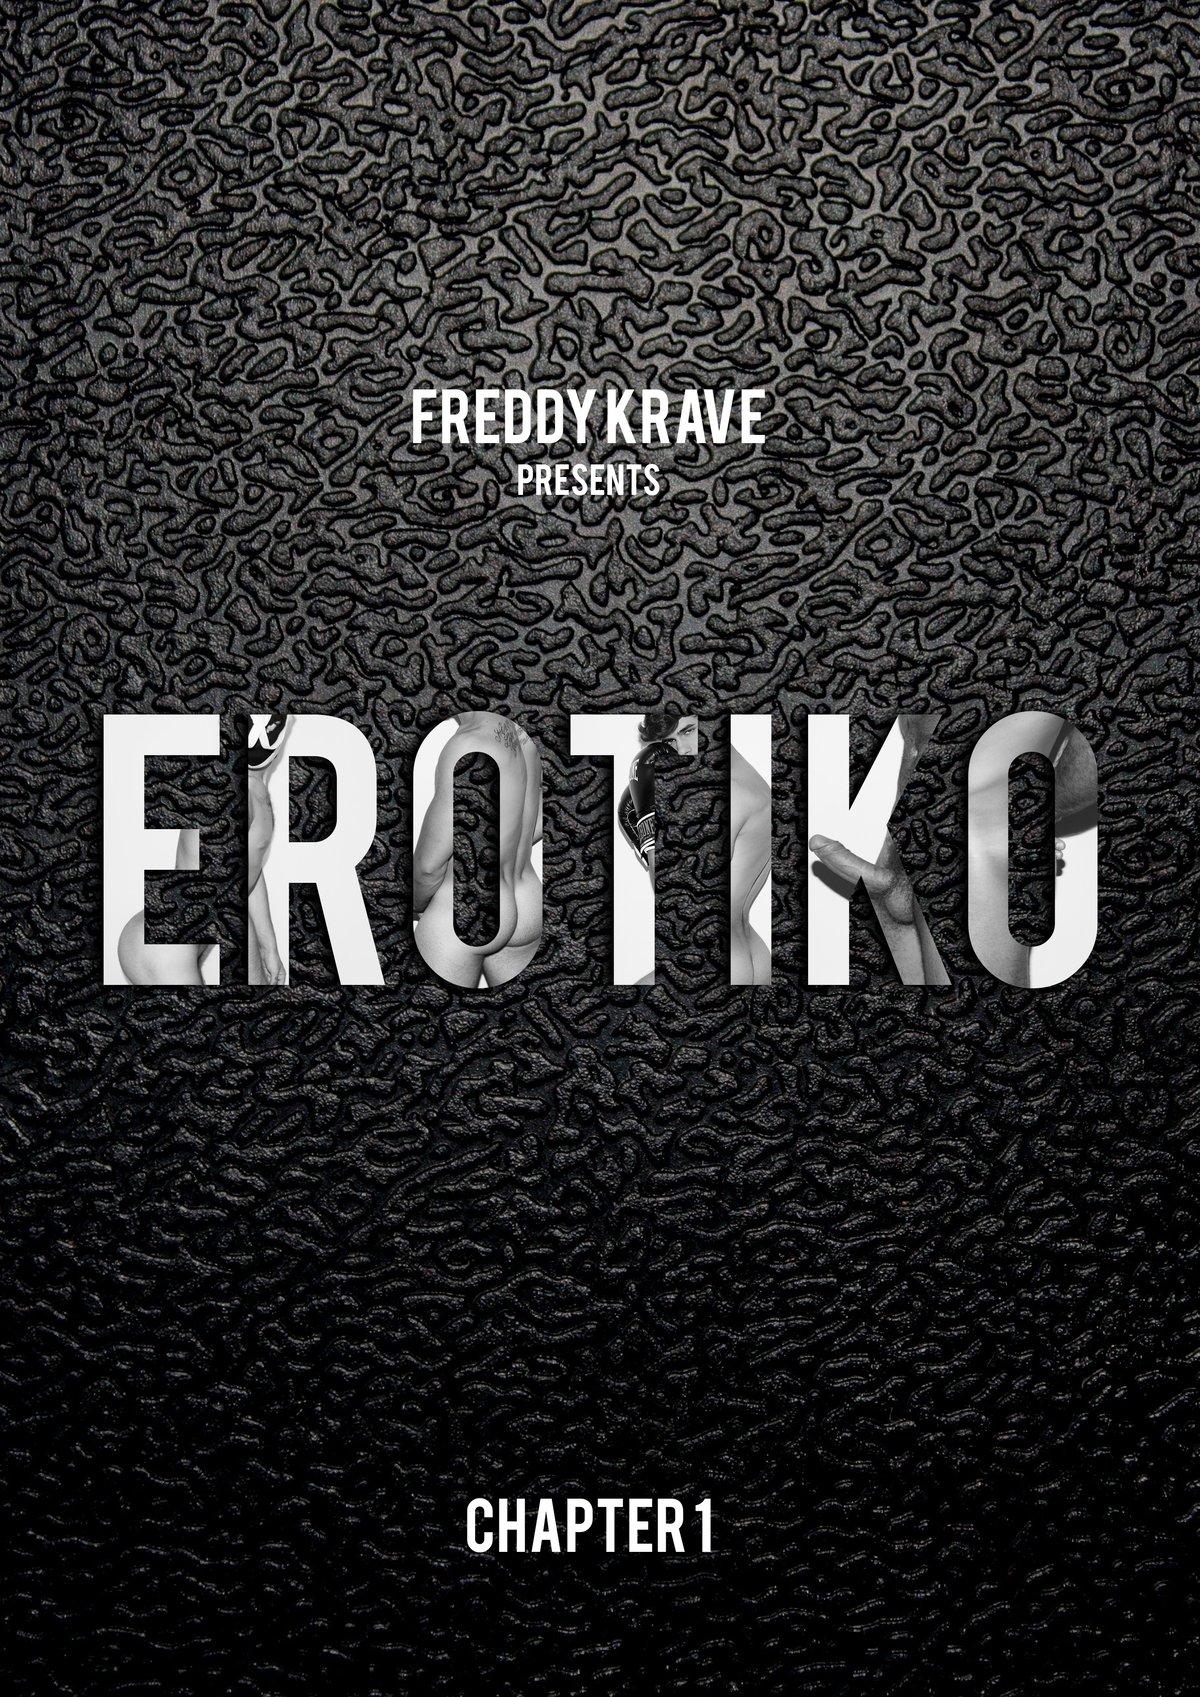 Image of EROTIKO